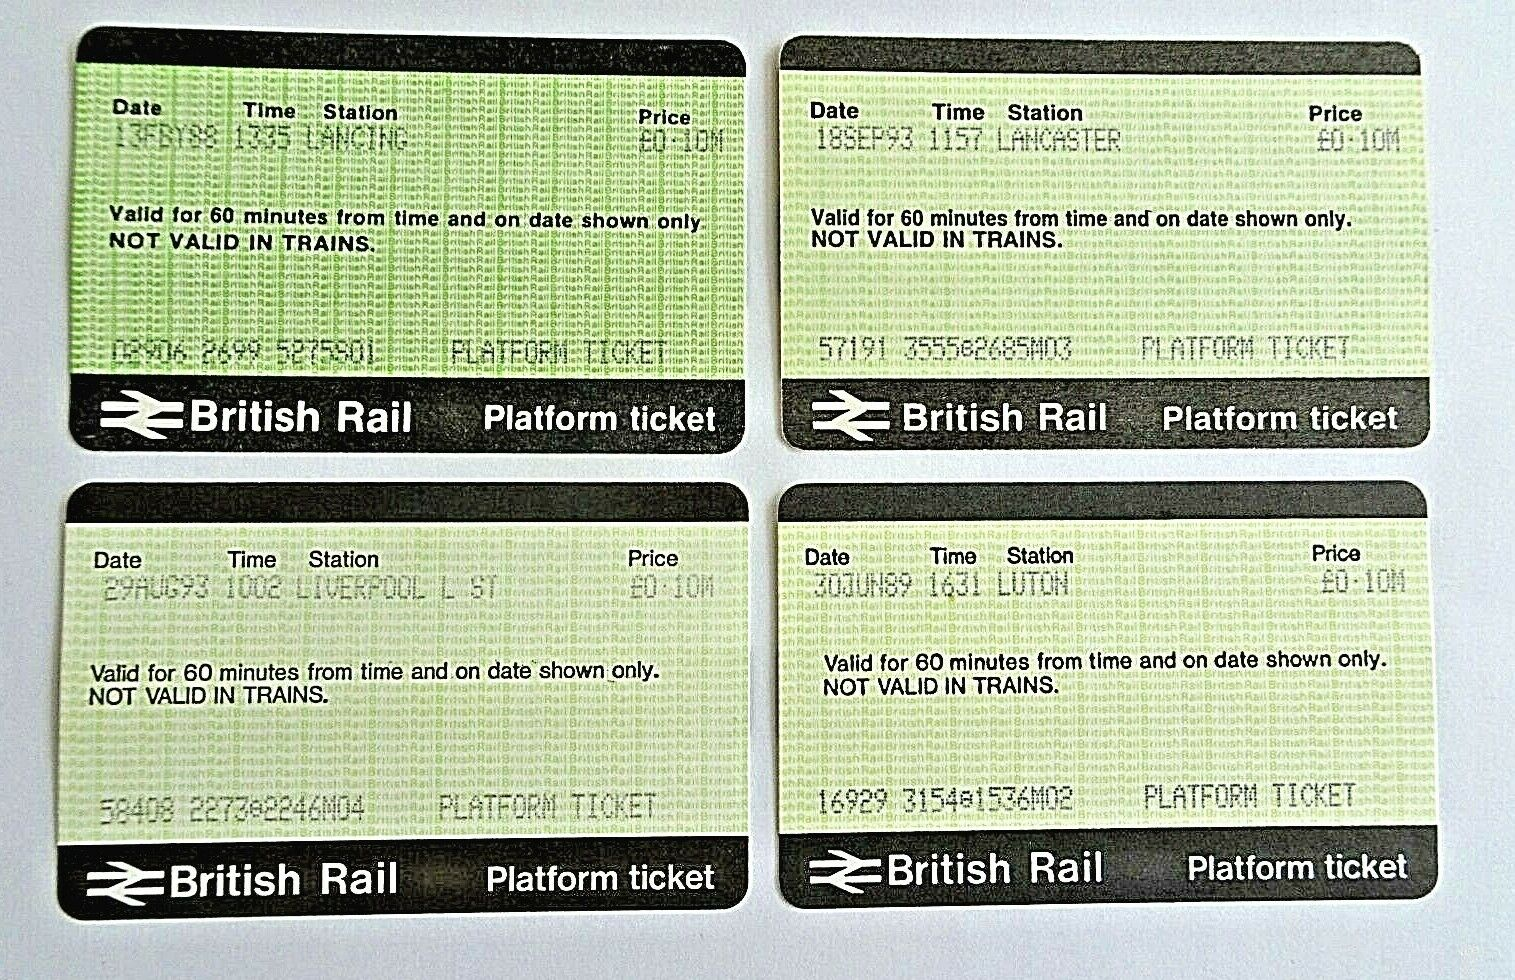 4 British Platform Tickets - Lancaster,Liverpool L St, Luton, Lancing 10p